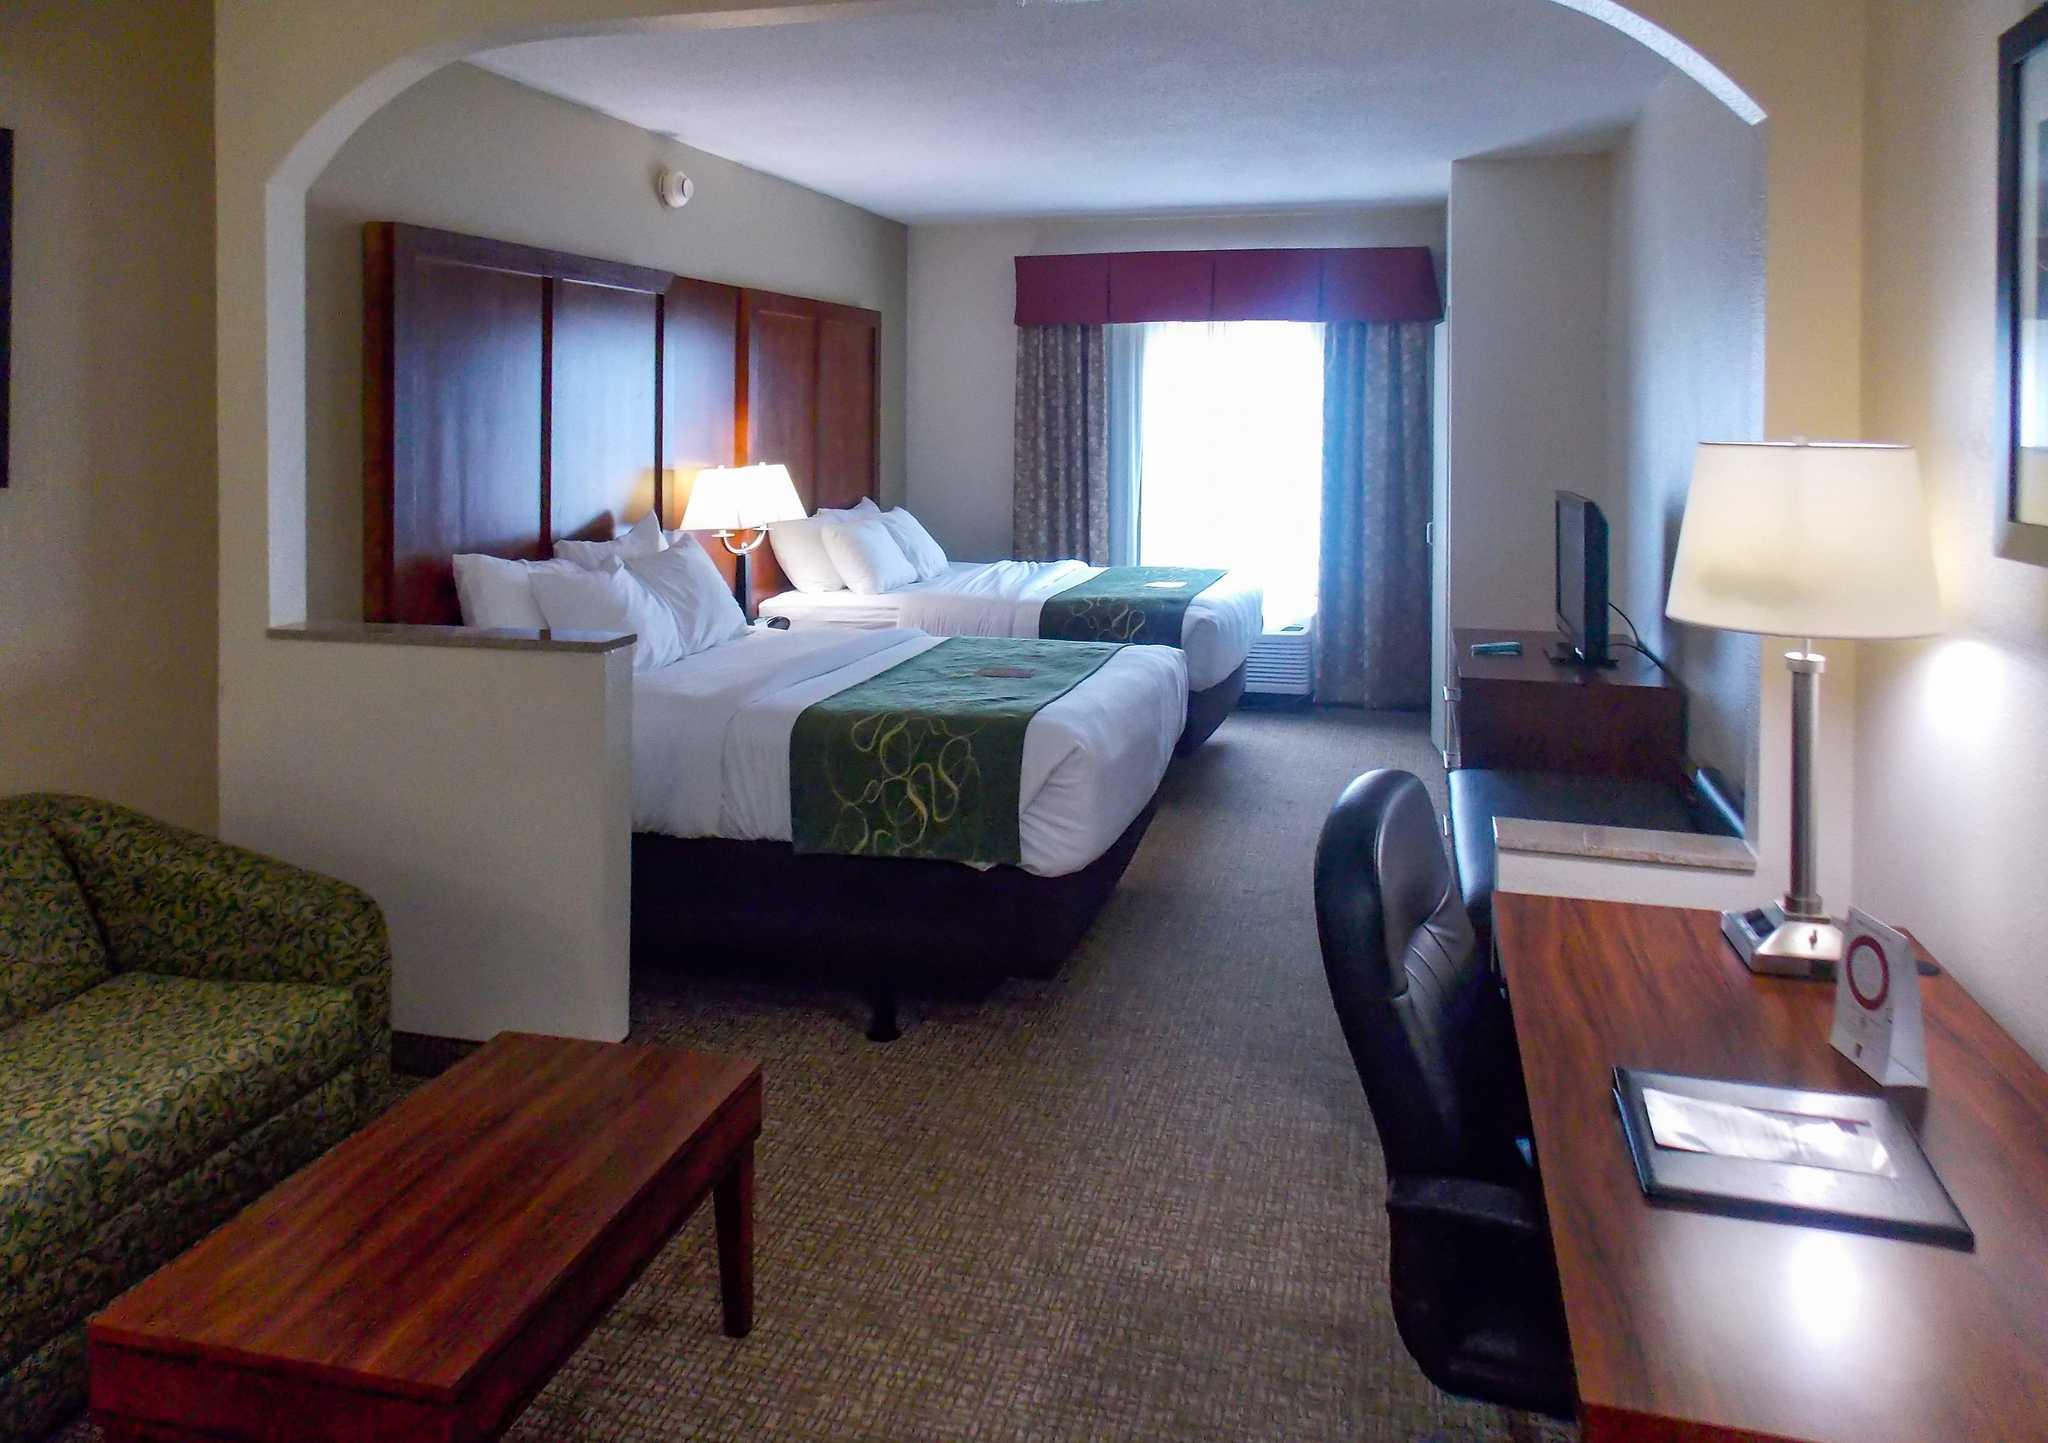 Comfort Suites Inn at Ridgewood Farm image 7